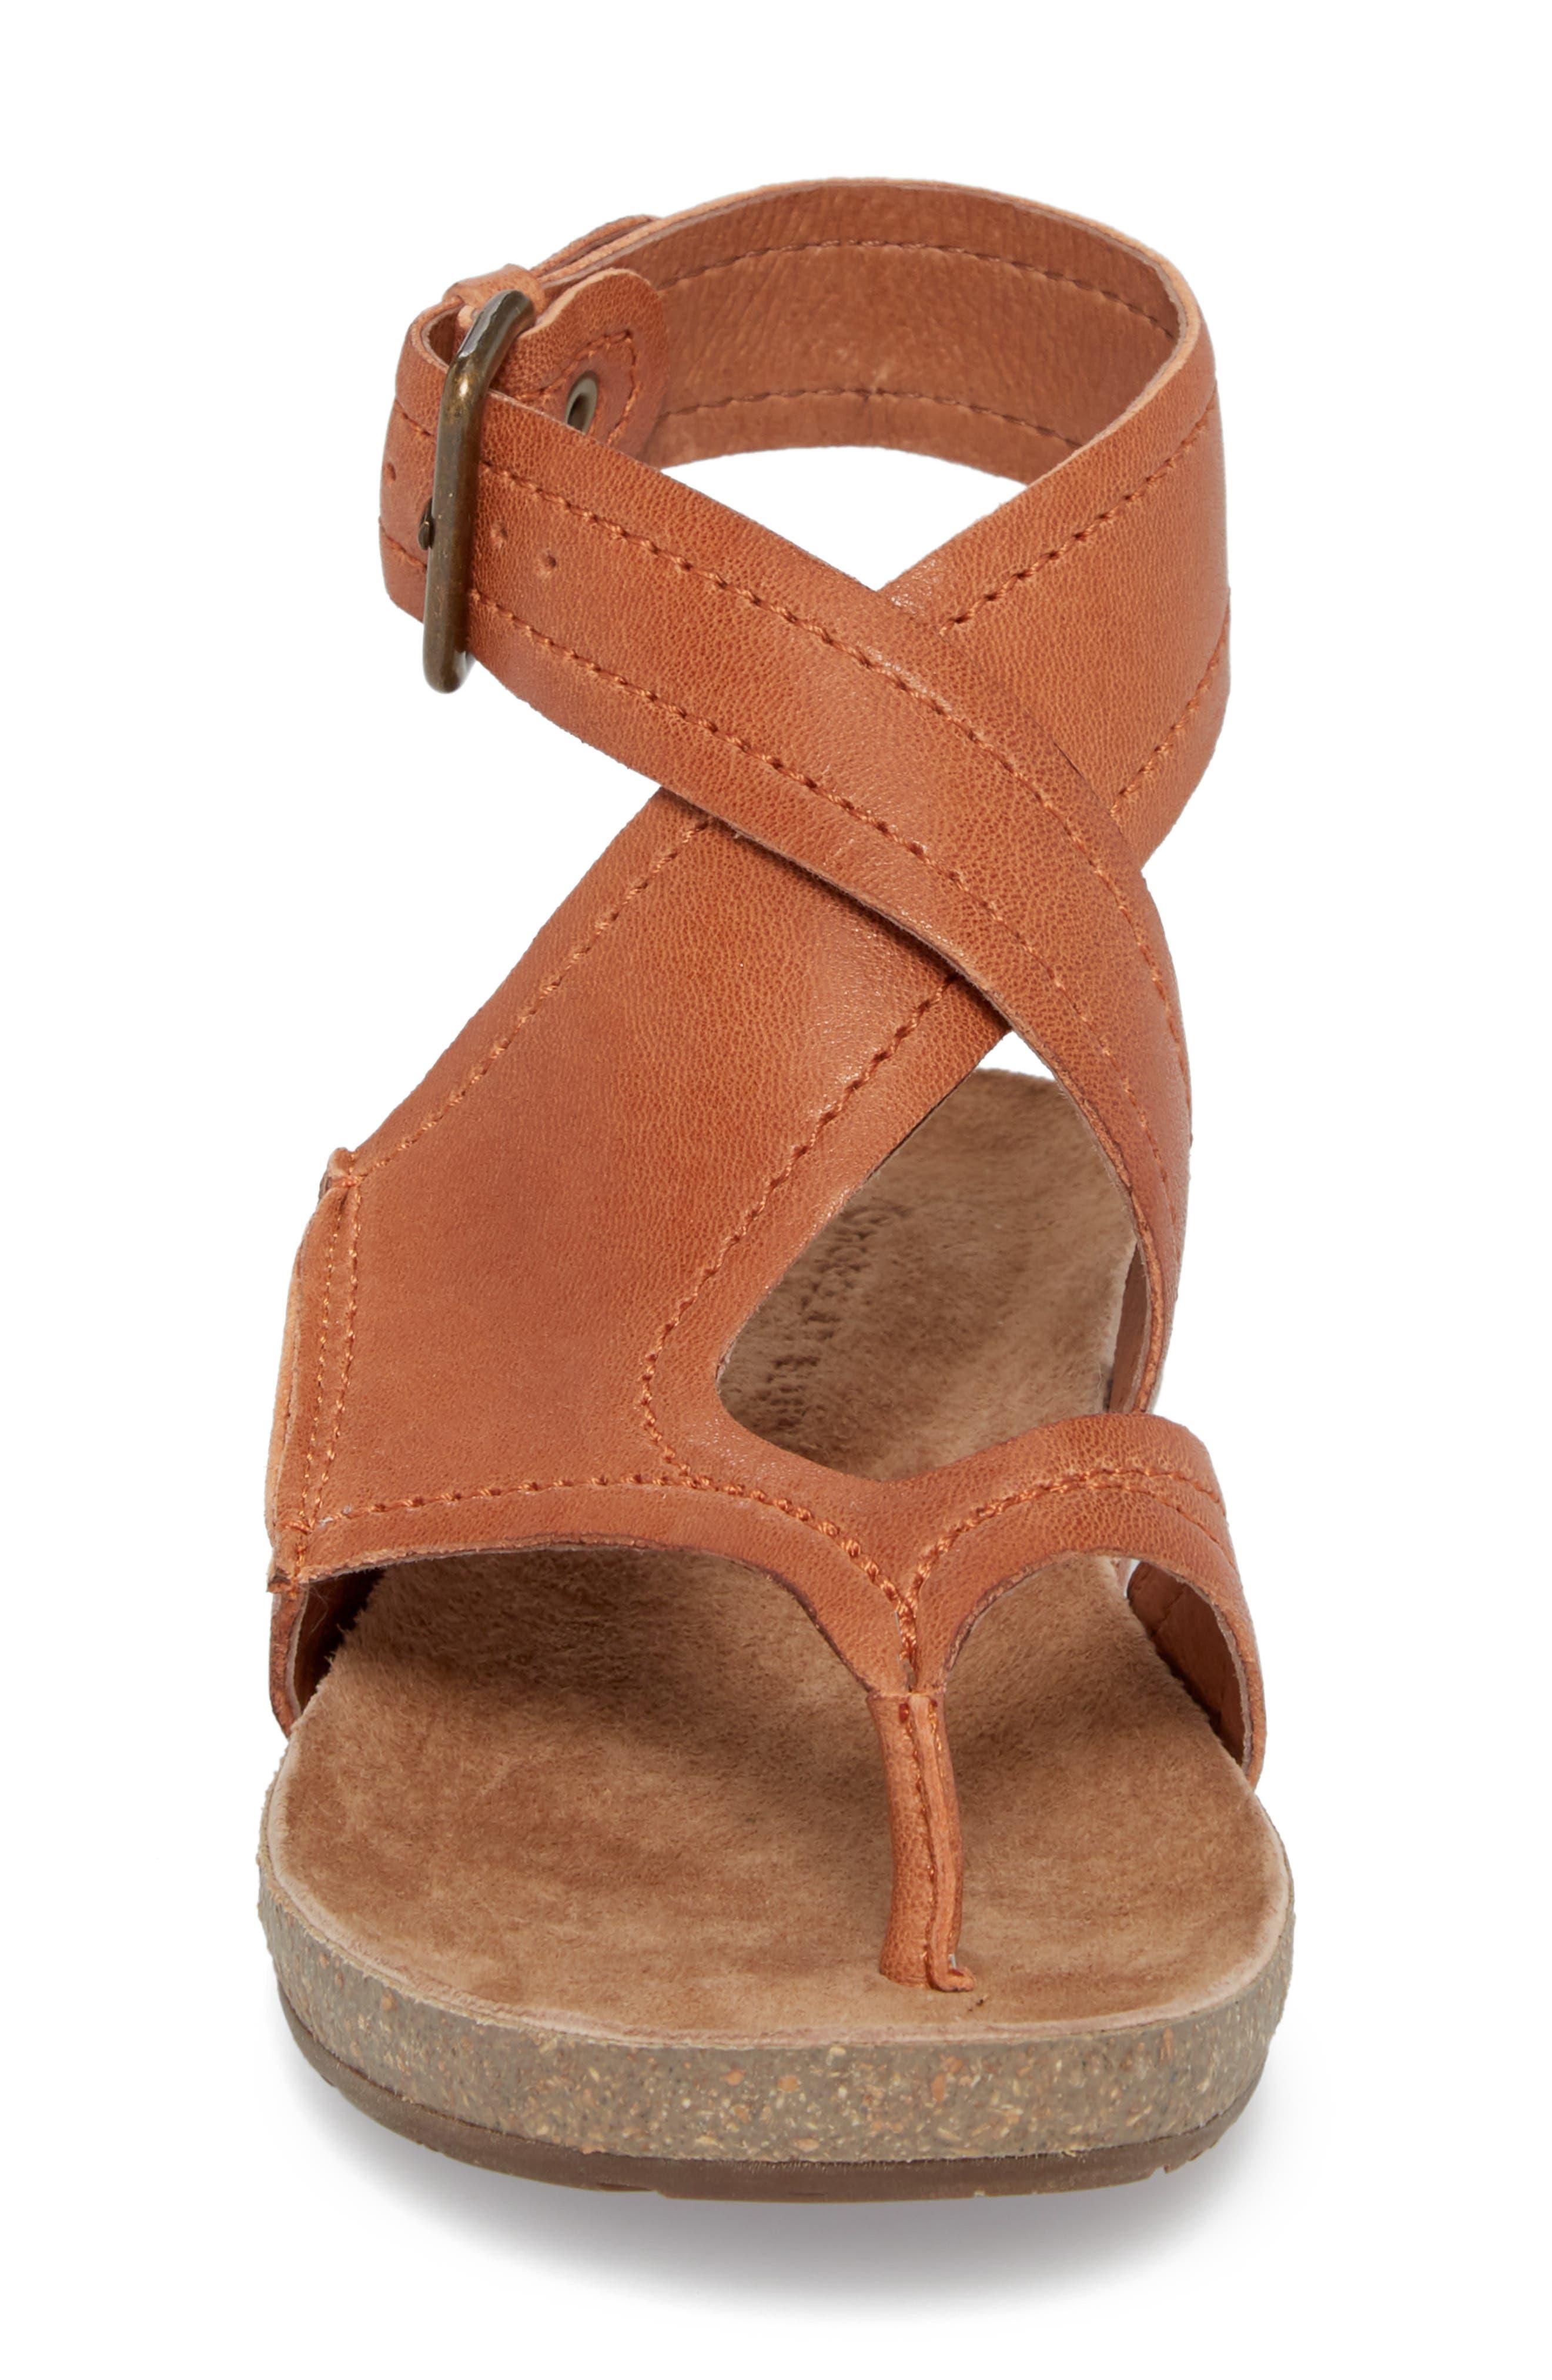 Yagger Sandal,                             Alternate thumbnail 4, color,                             Camel Leather